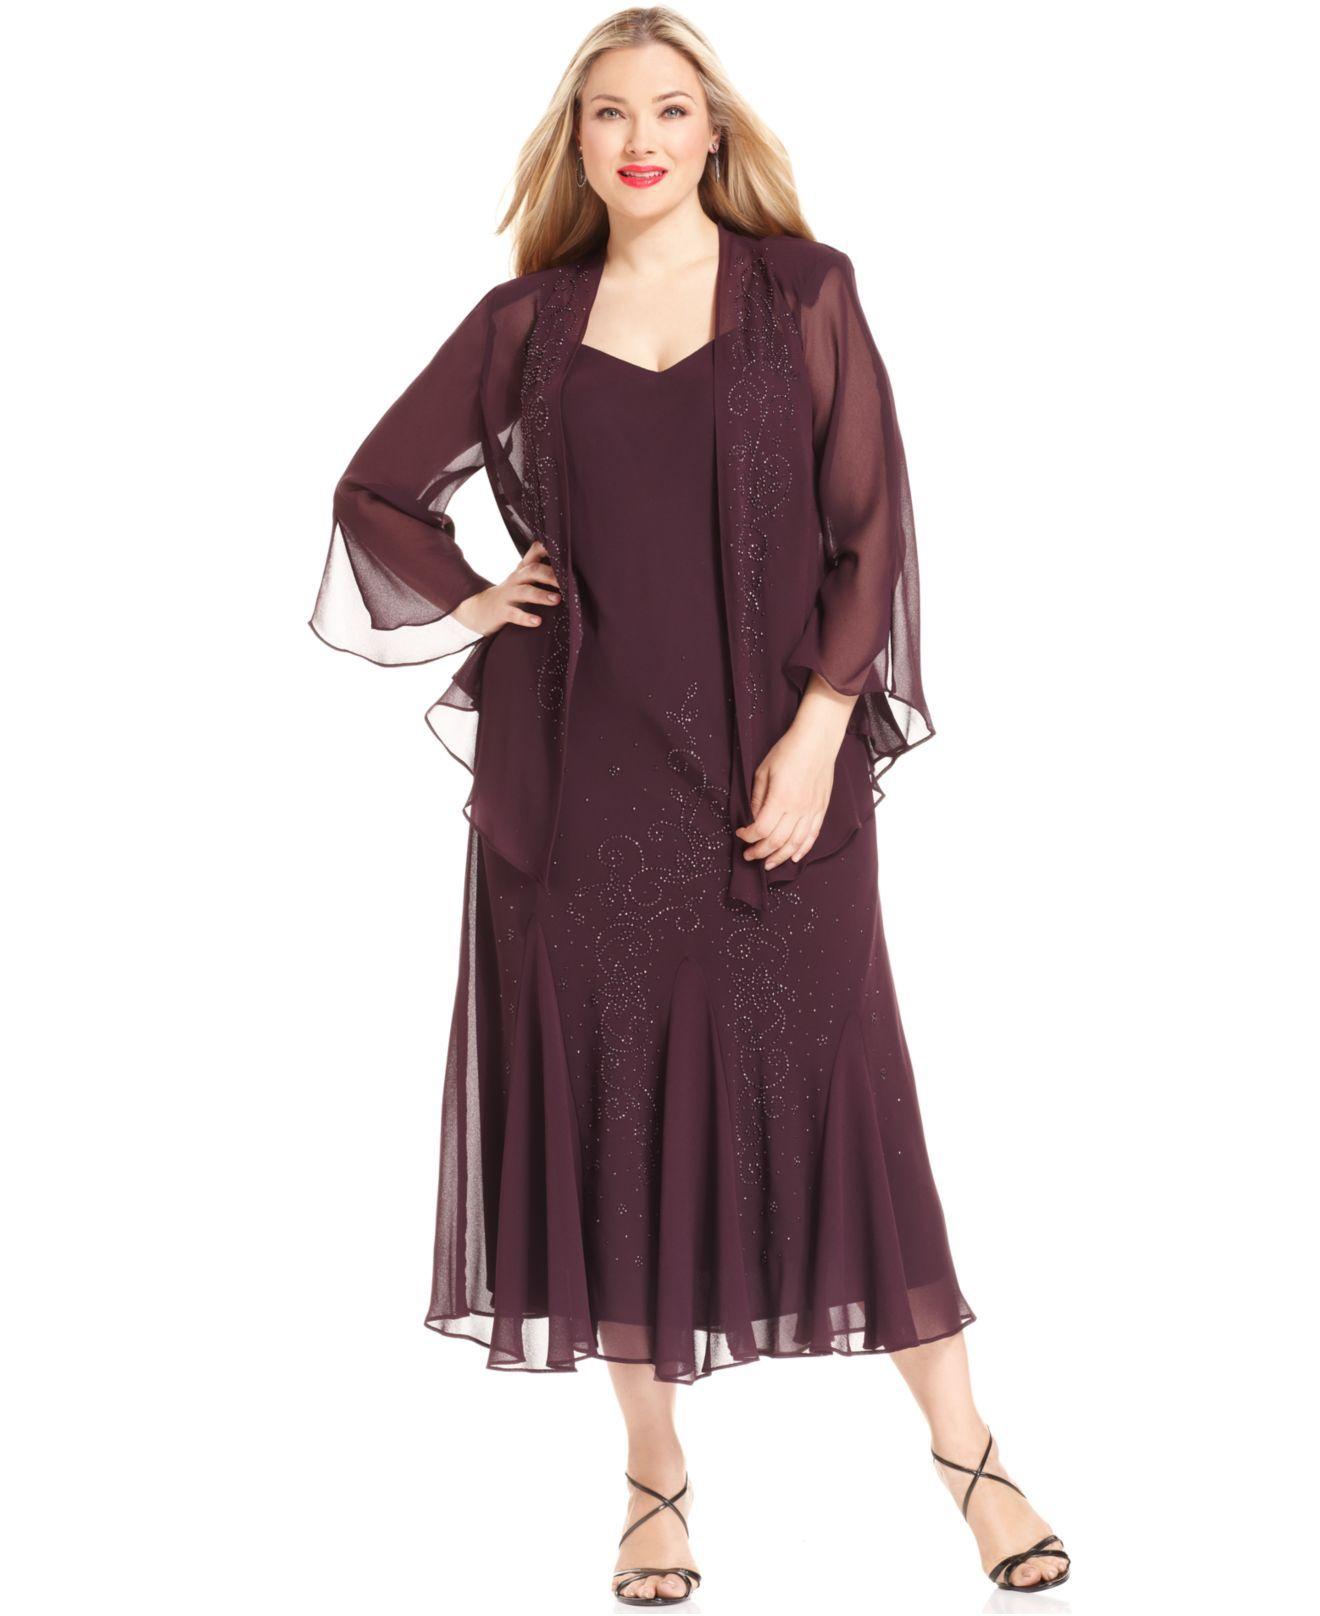 Rm Richards Plus Size Beaded V Neck Dress And Jacket Dress Online